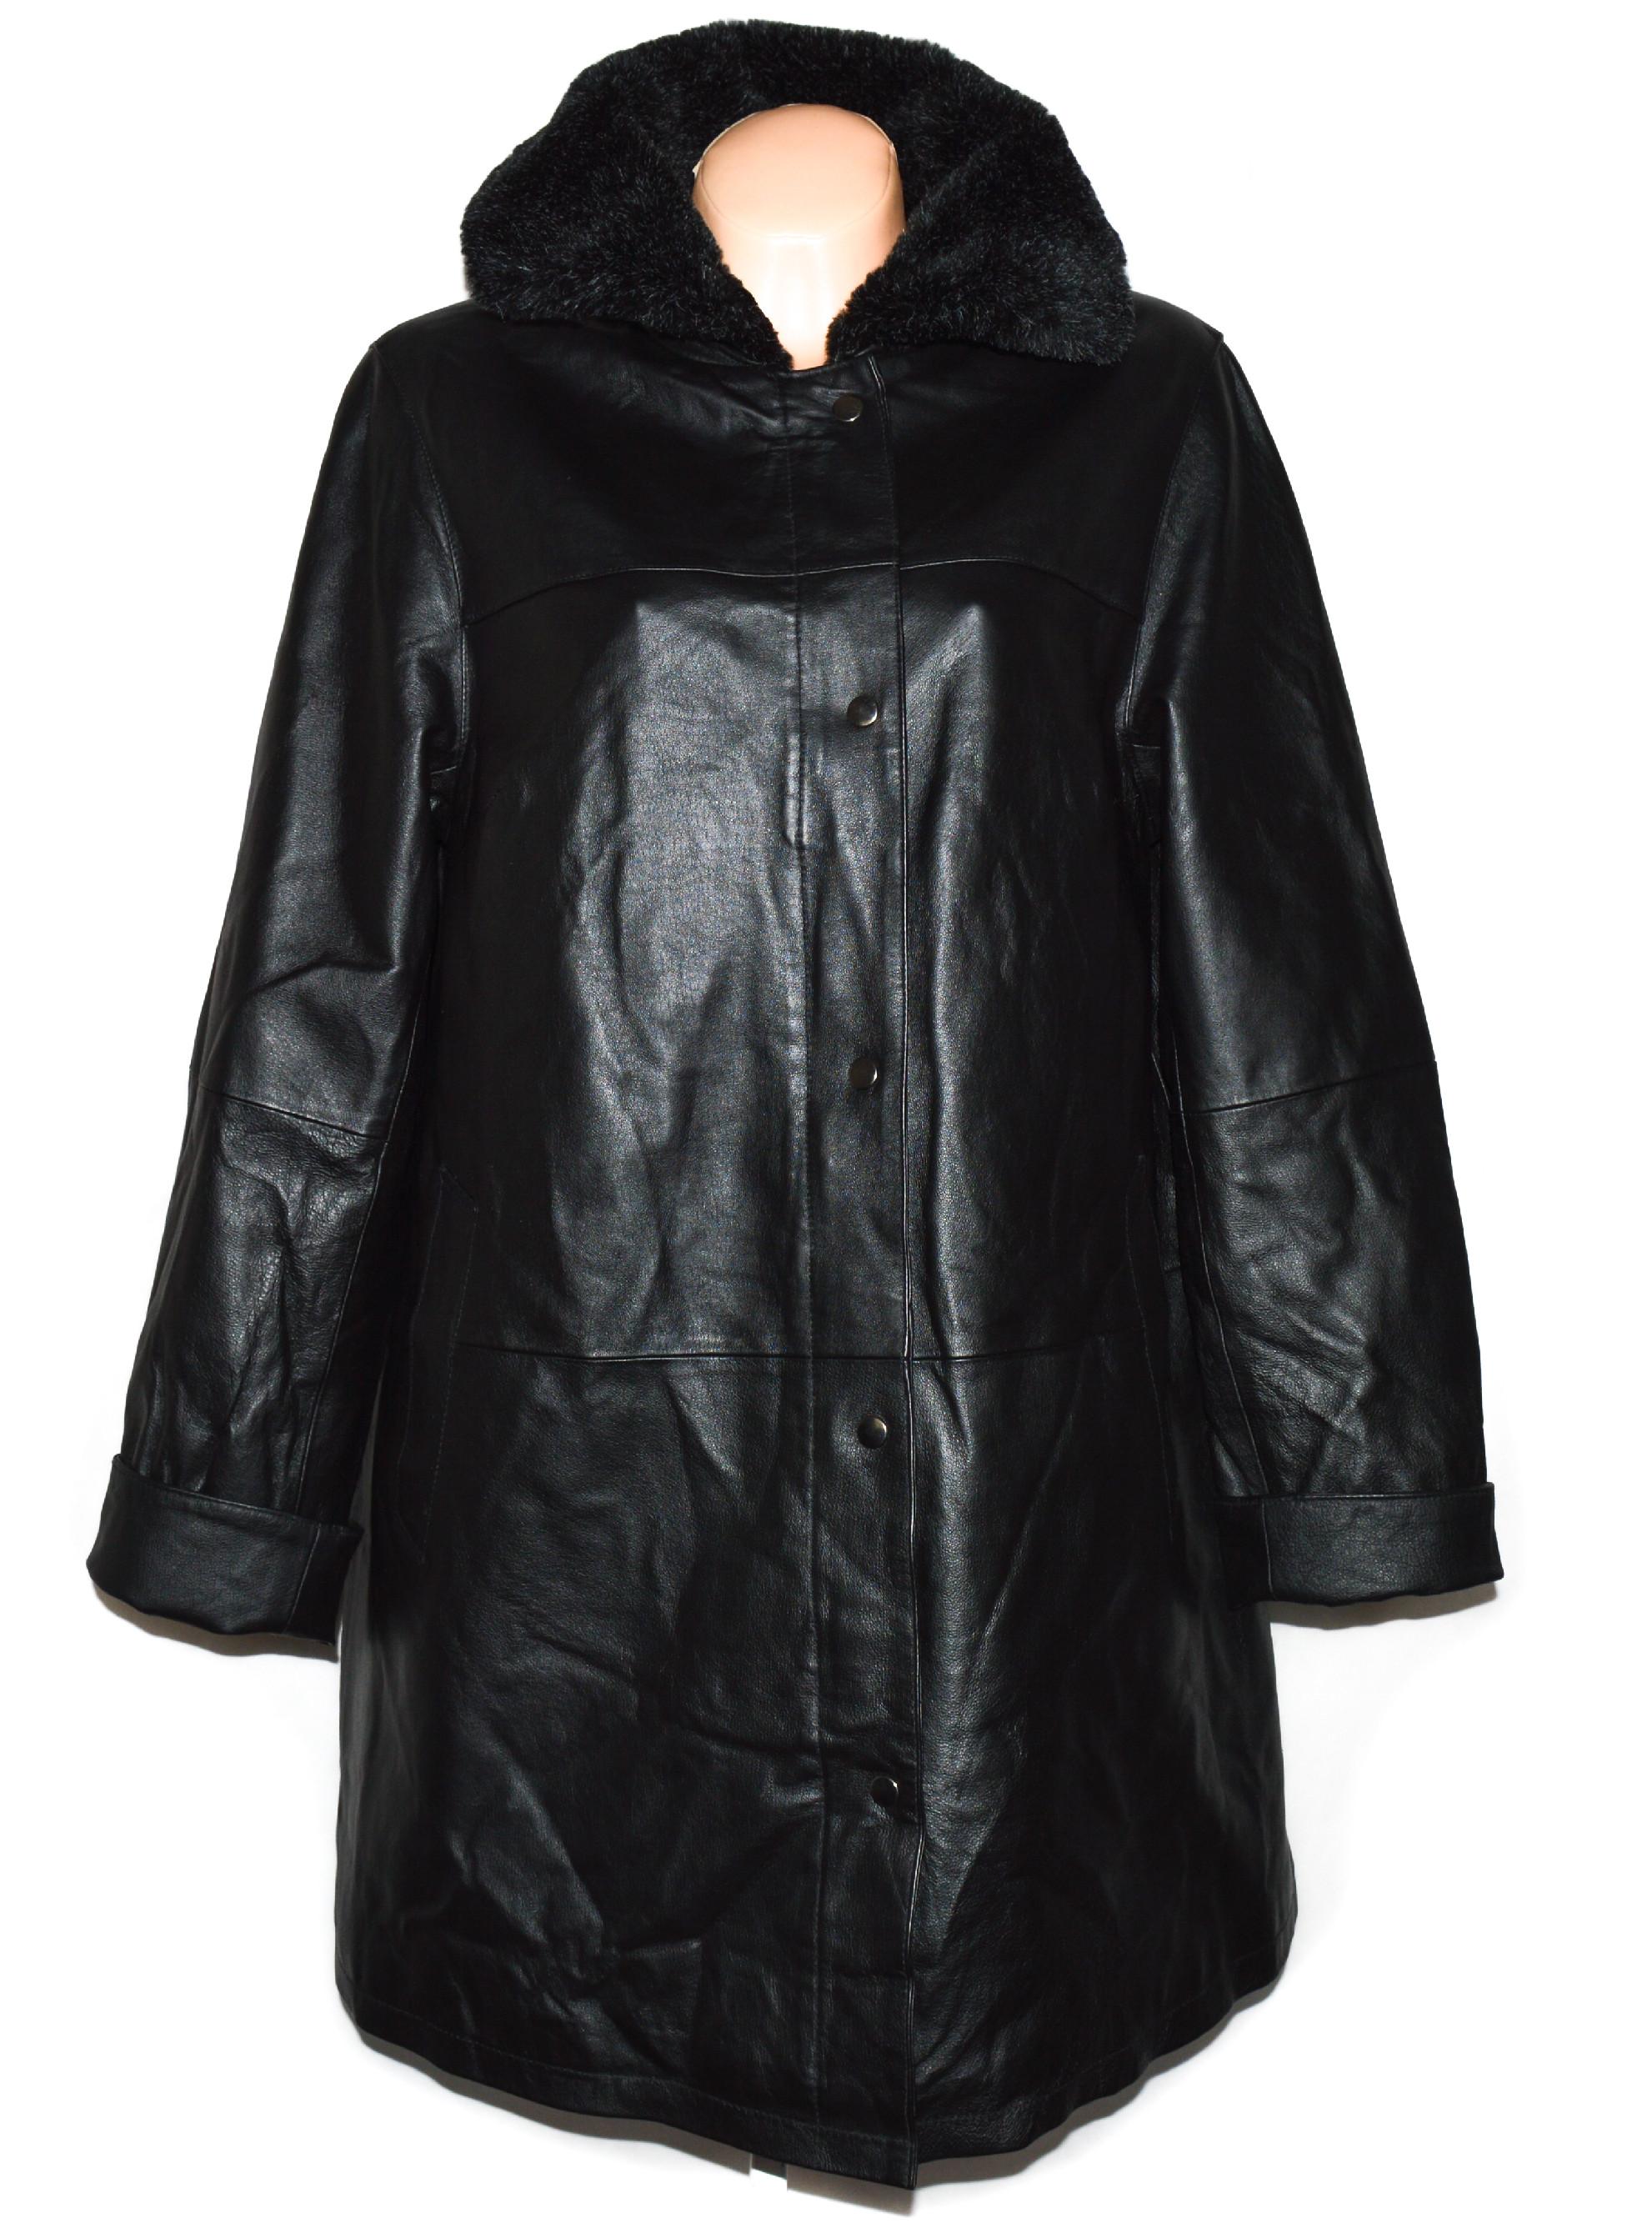 KOŽENÝ dámský černý měkký zateplený kabát s kožíškem XXL